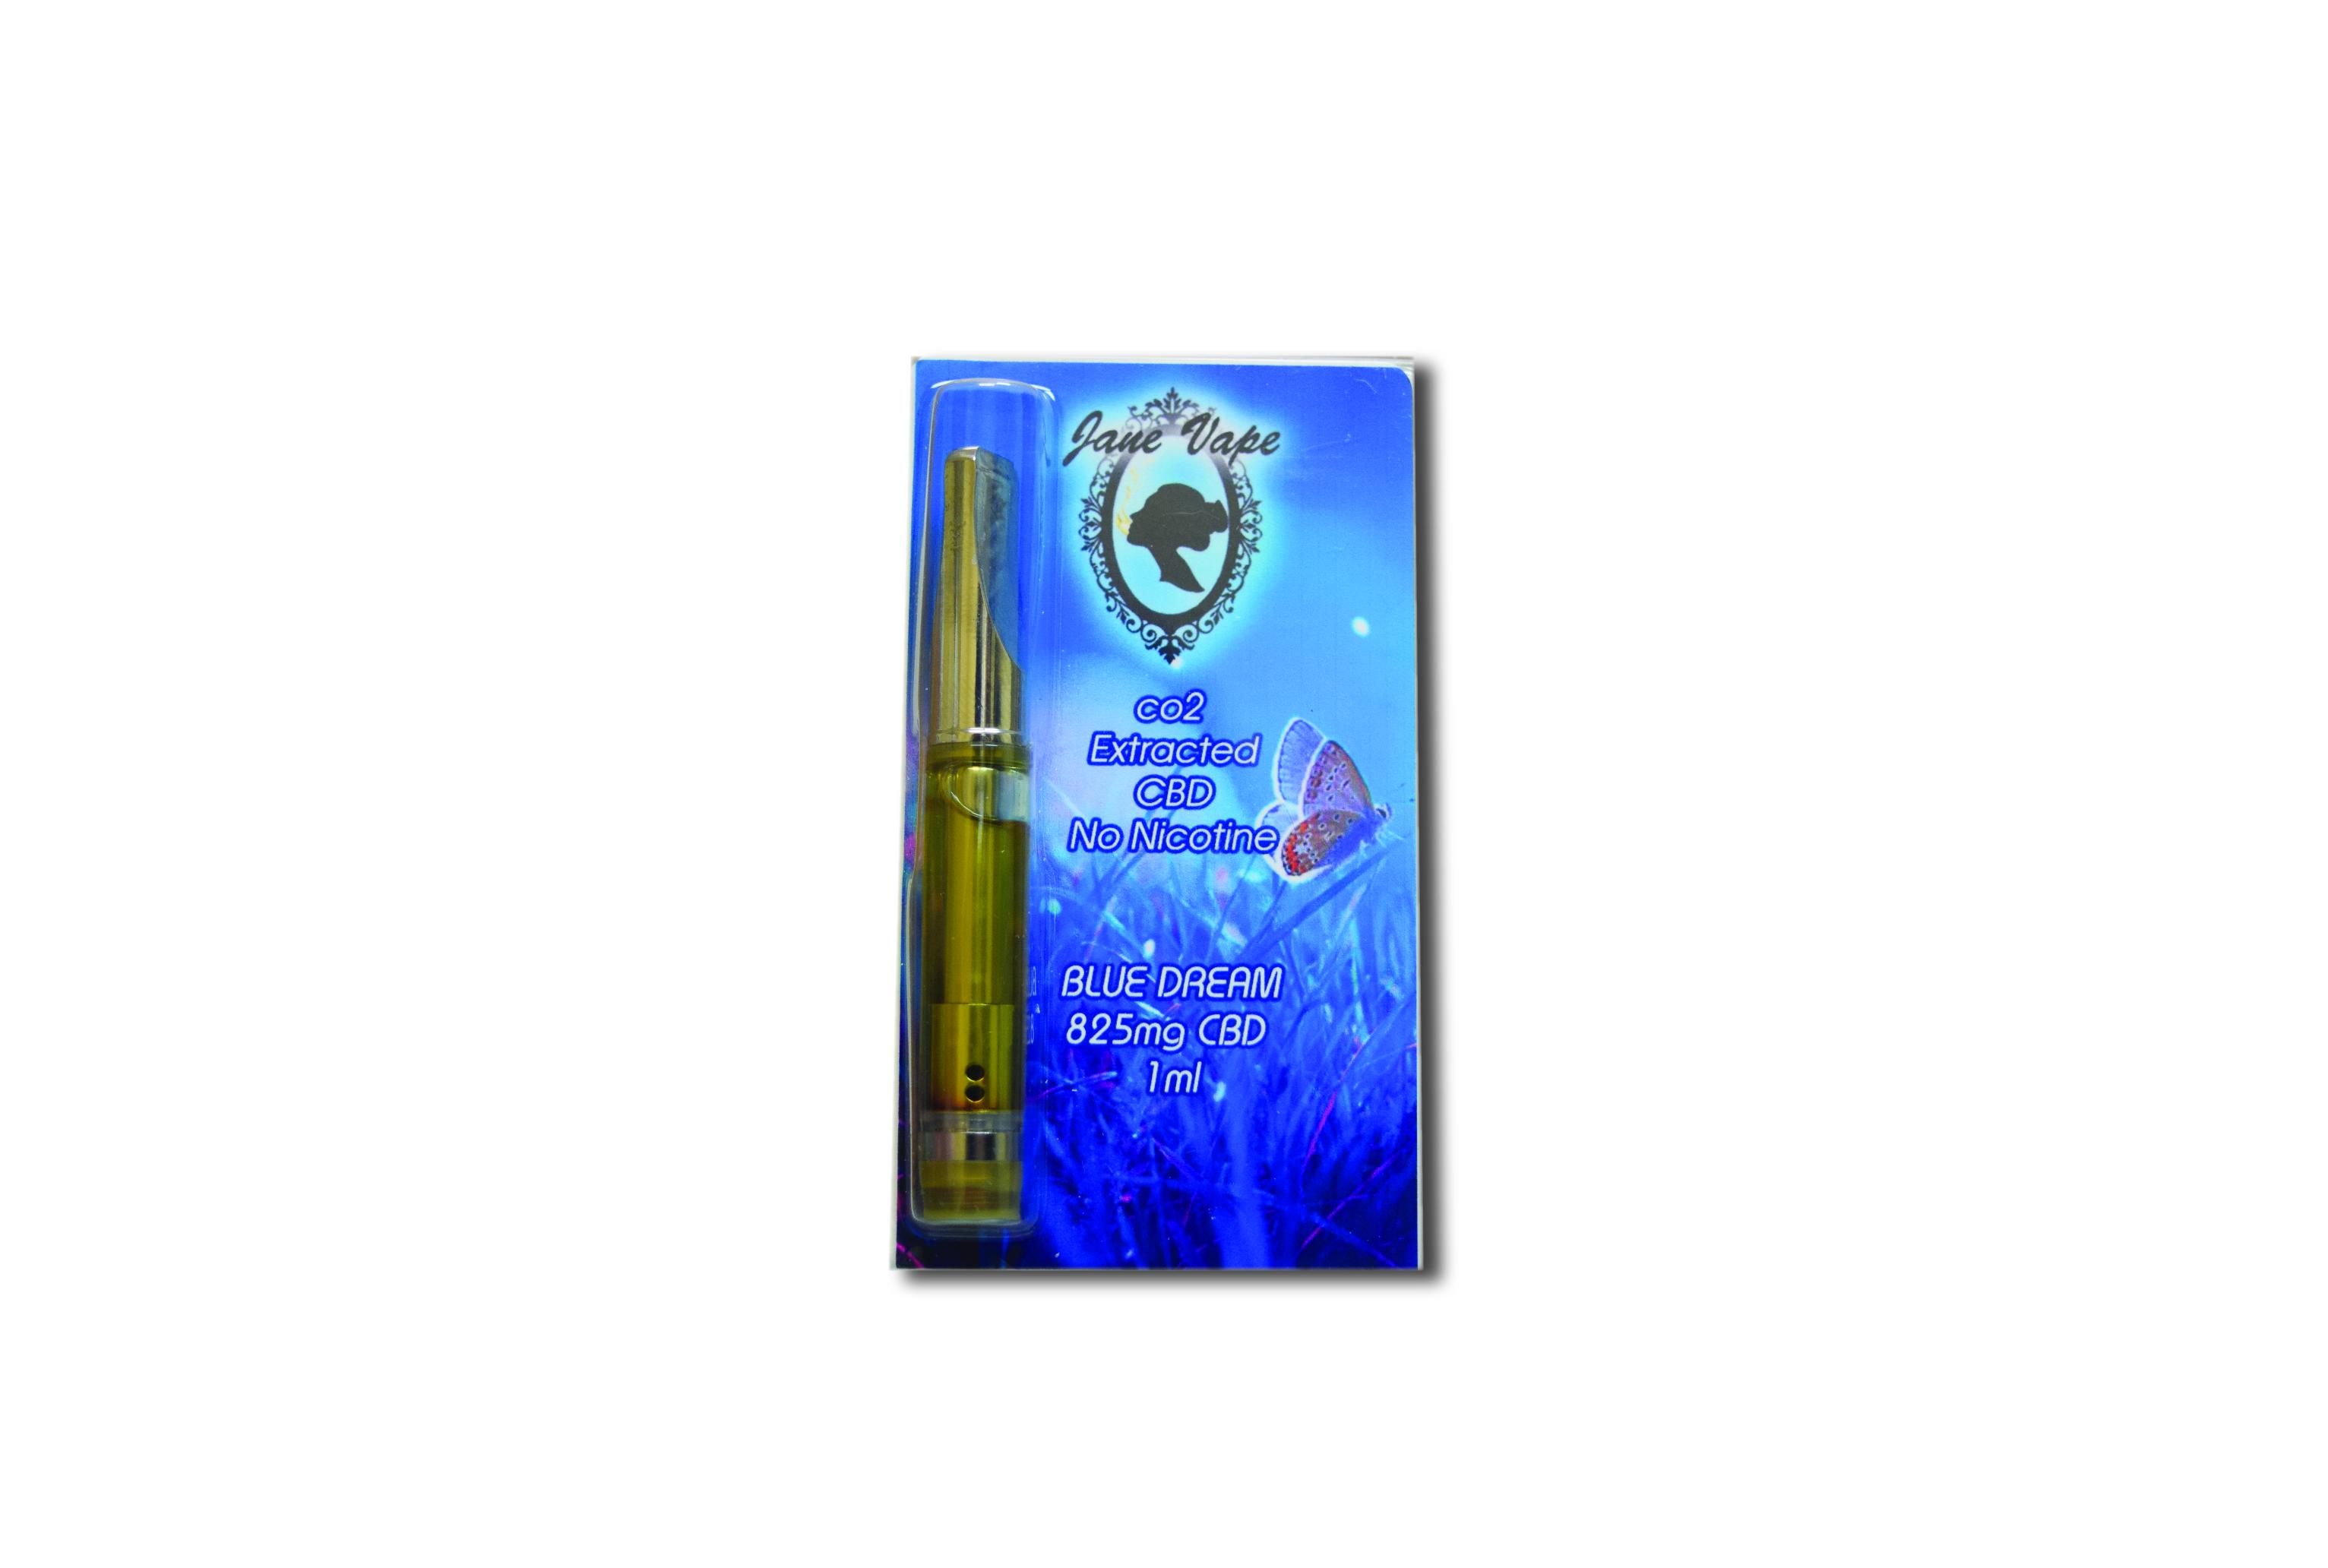 825mg vape cartridge blue dream